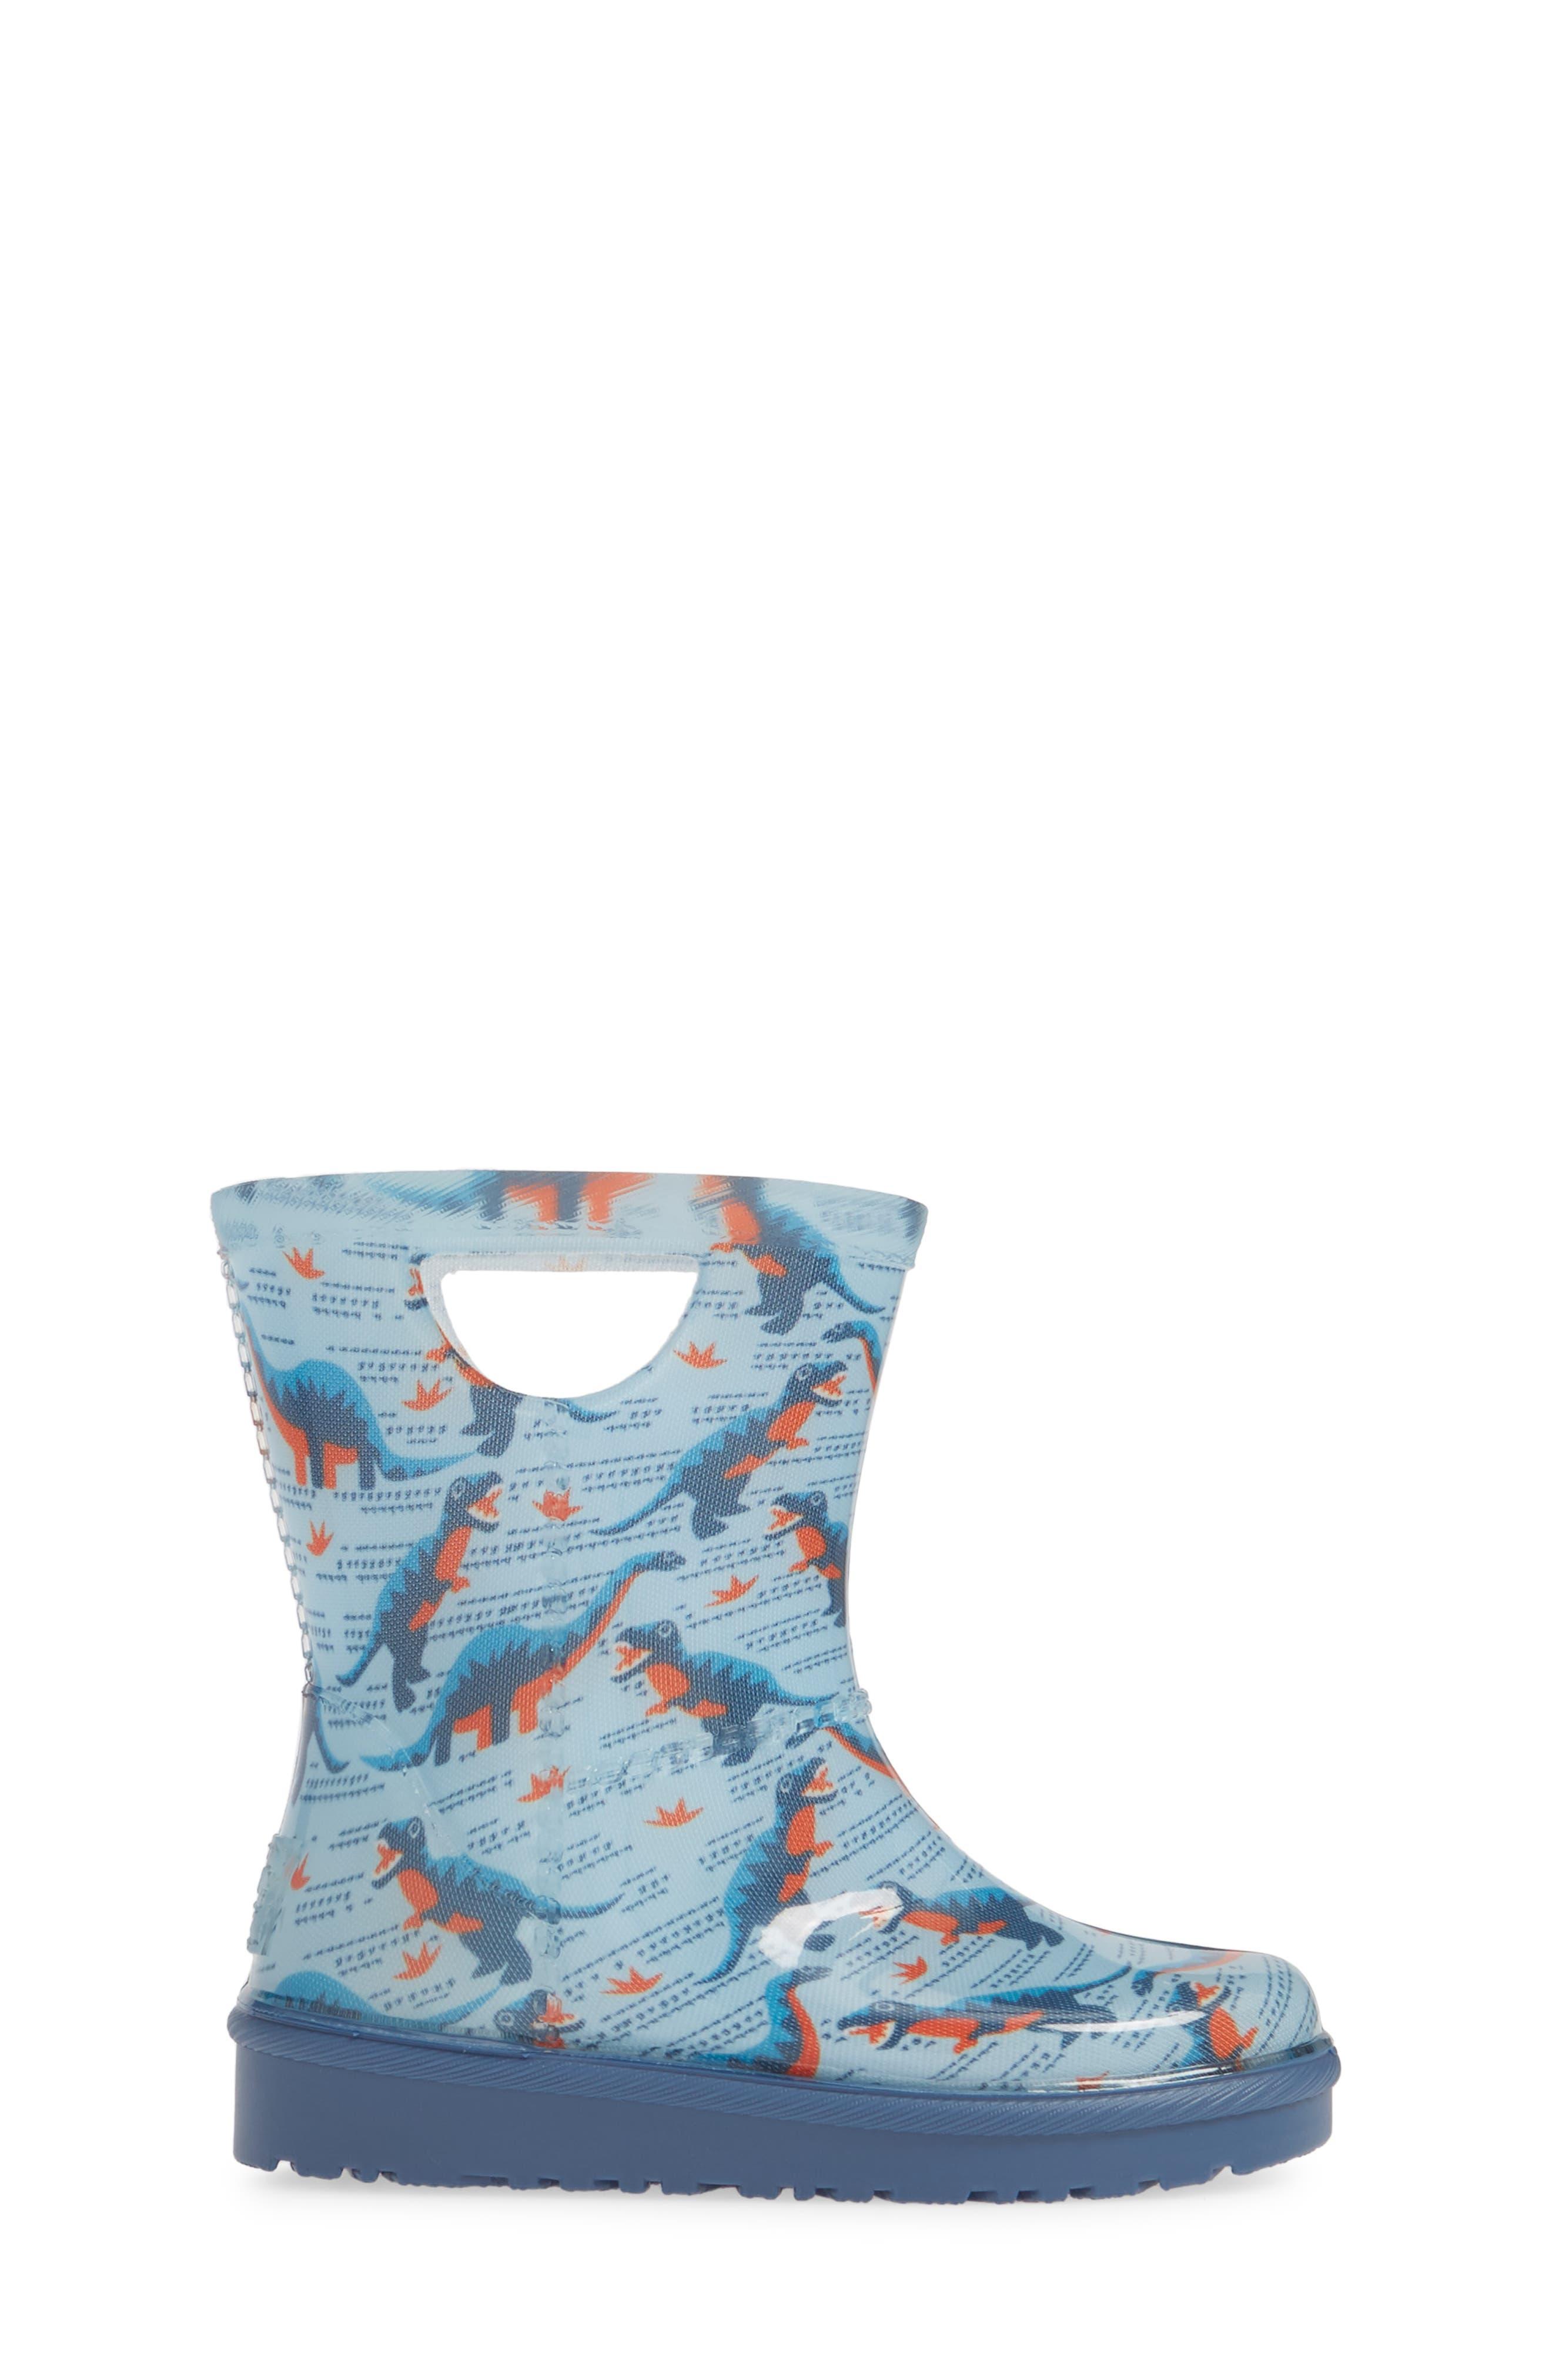 UGG<SUP>®</SUP>, Rahjee Waterproof Rain Boot, Alternate thumbnail 3, color, BALLAD BLUE